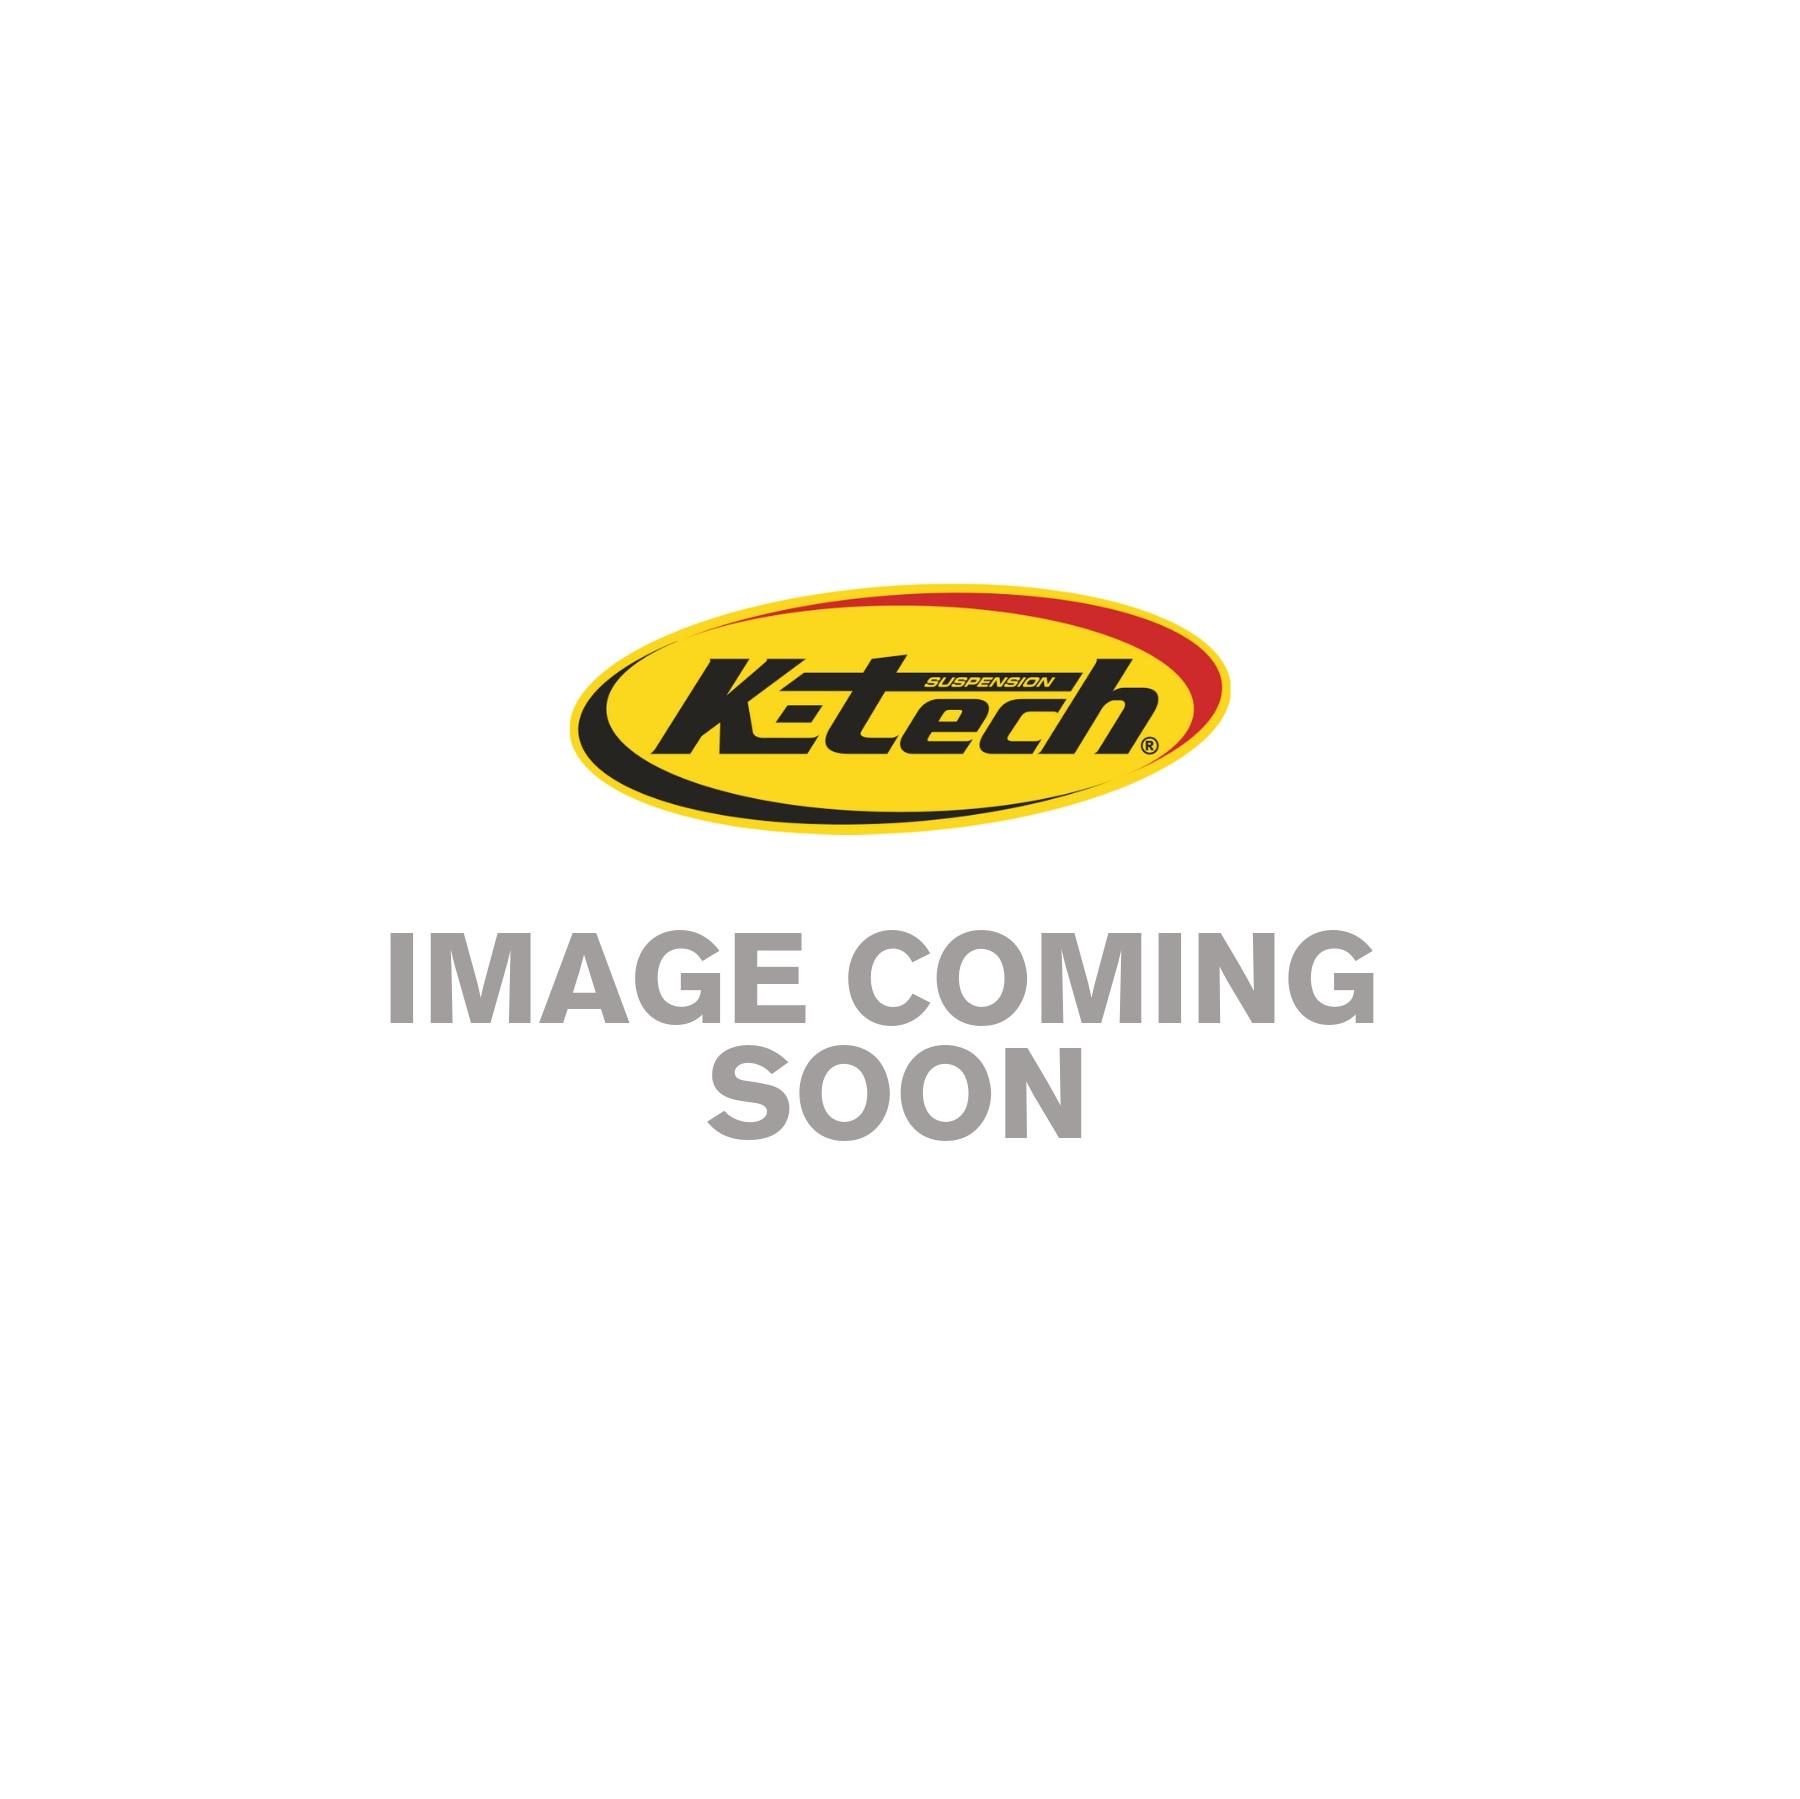 ORDS Front Fork Cartridges KTM 50SX 2012>, HVA TC50 2017> WP